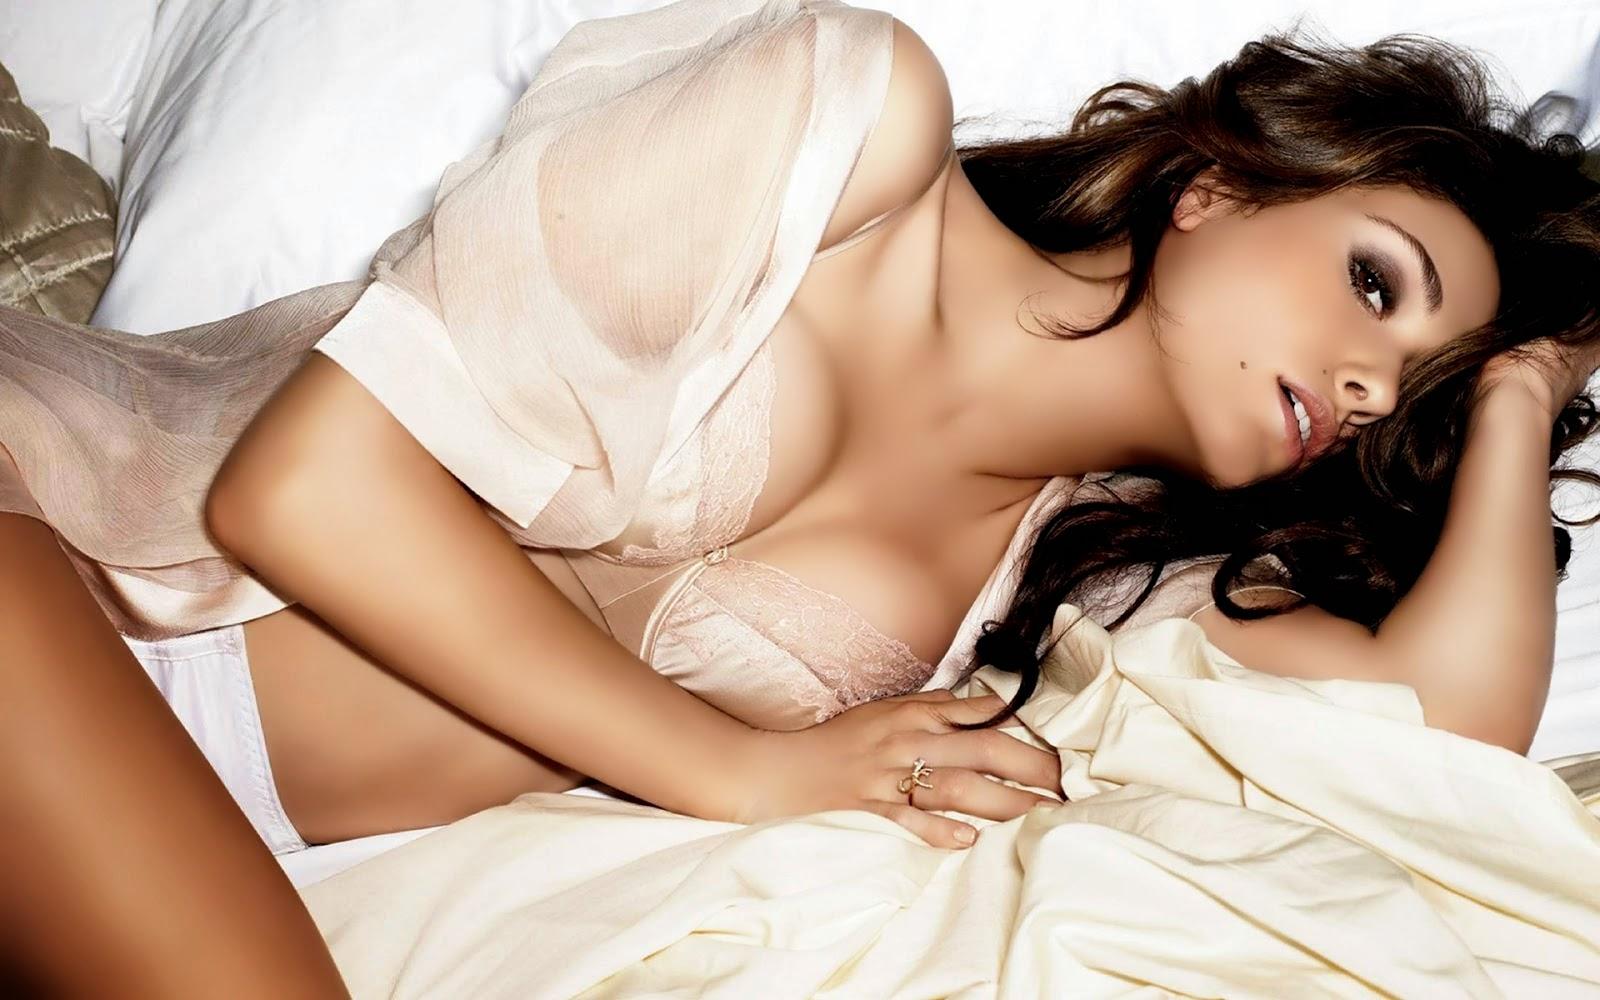 Emmy Rossum desnuda en Shameless 4x01 La